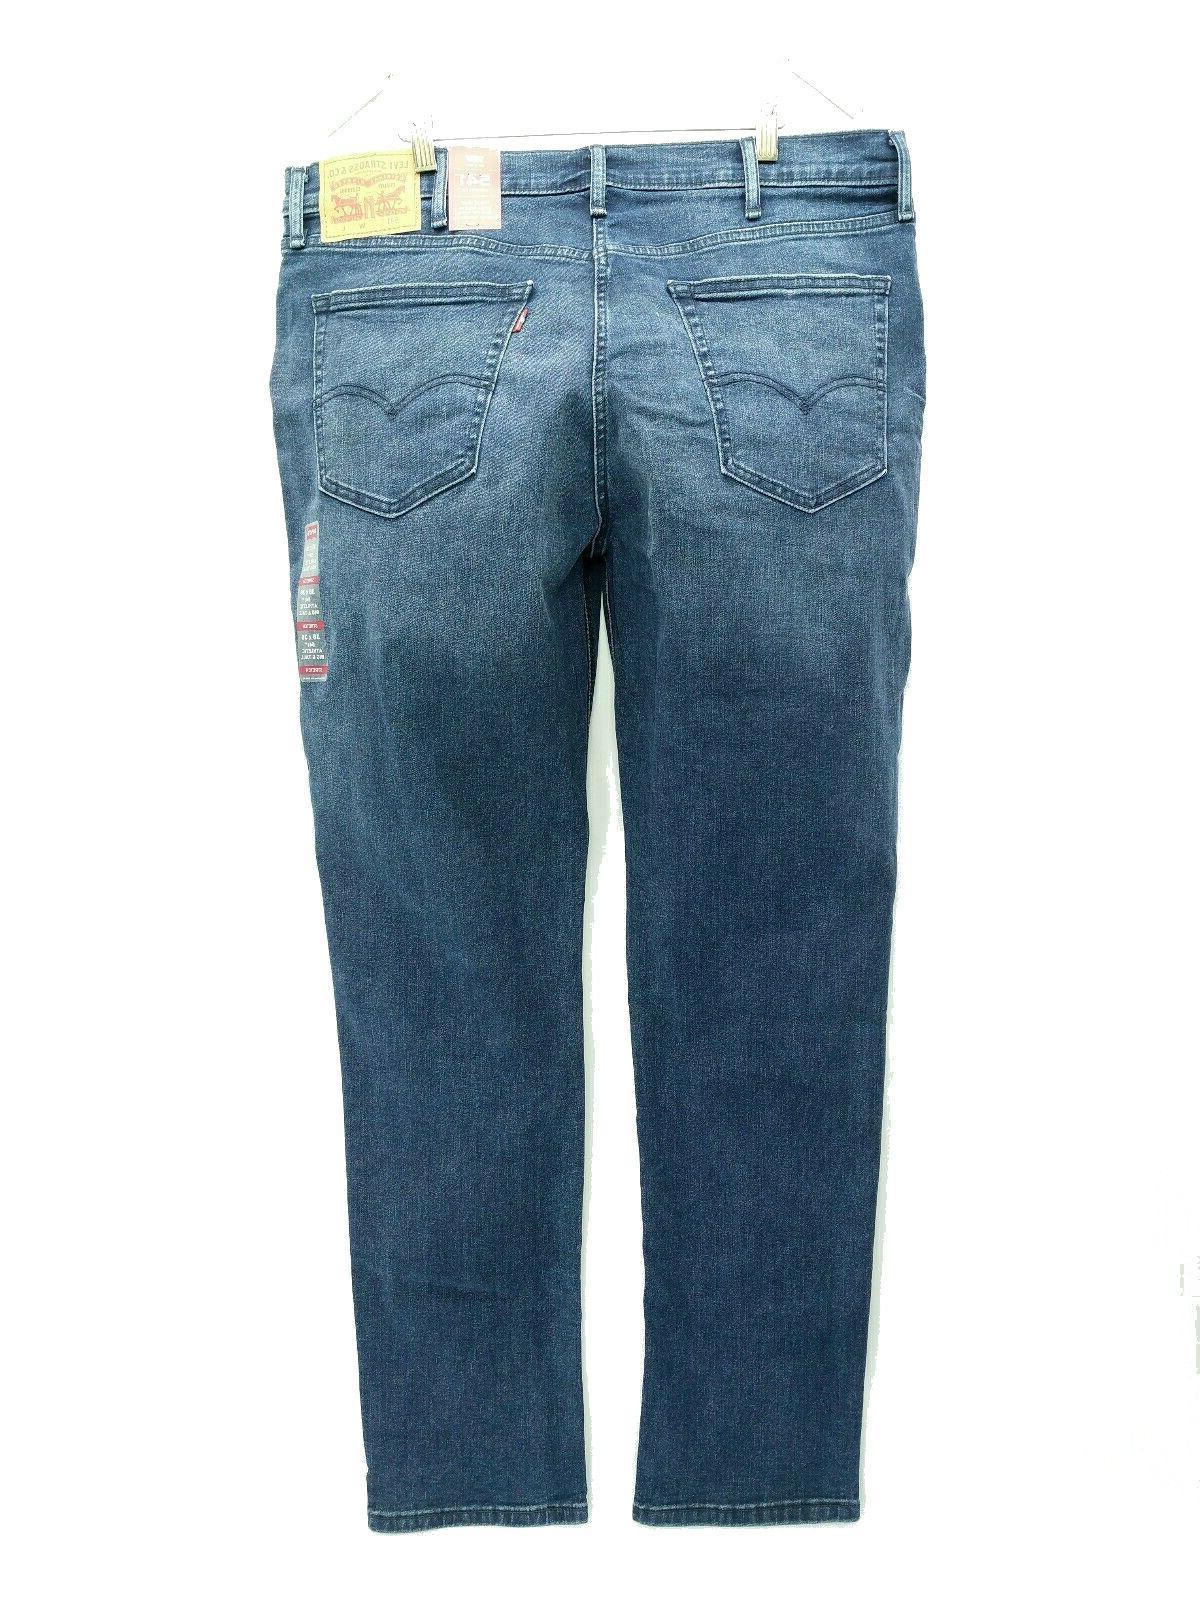 Levi's 541 Jeans Men's Blue Stretch Denim Fit Tall MSRP $79.50